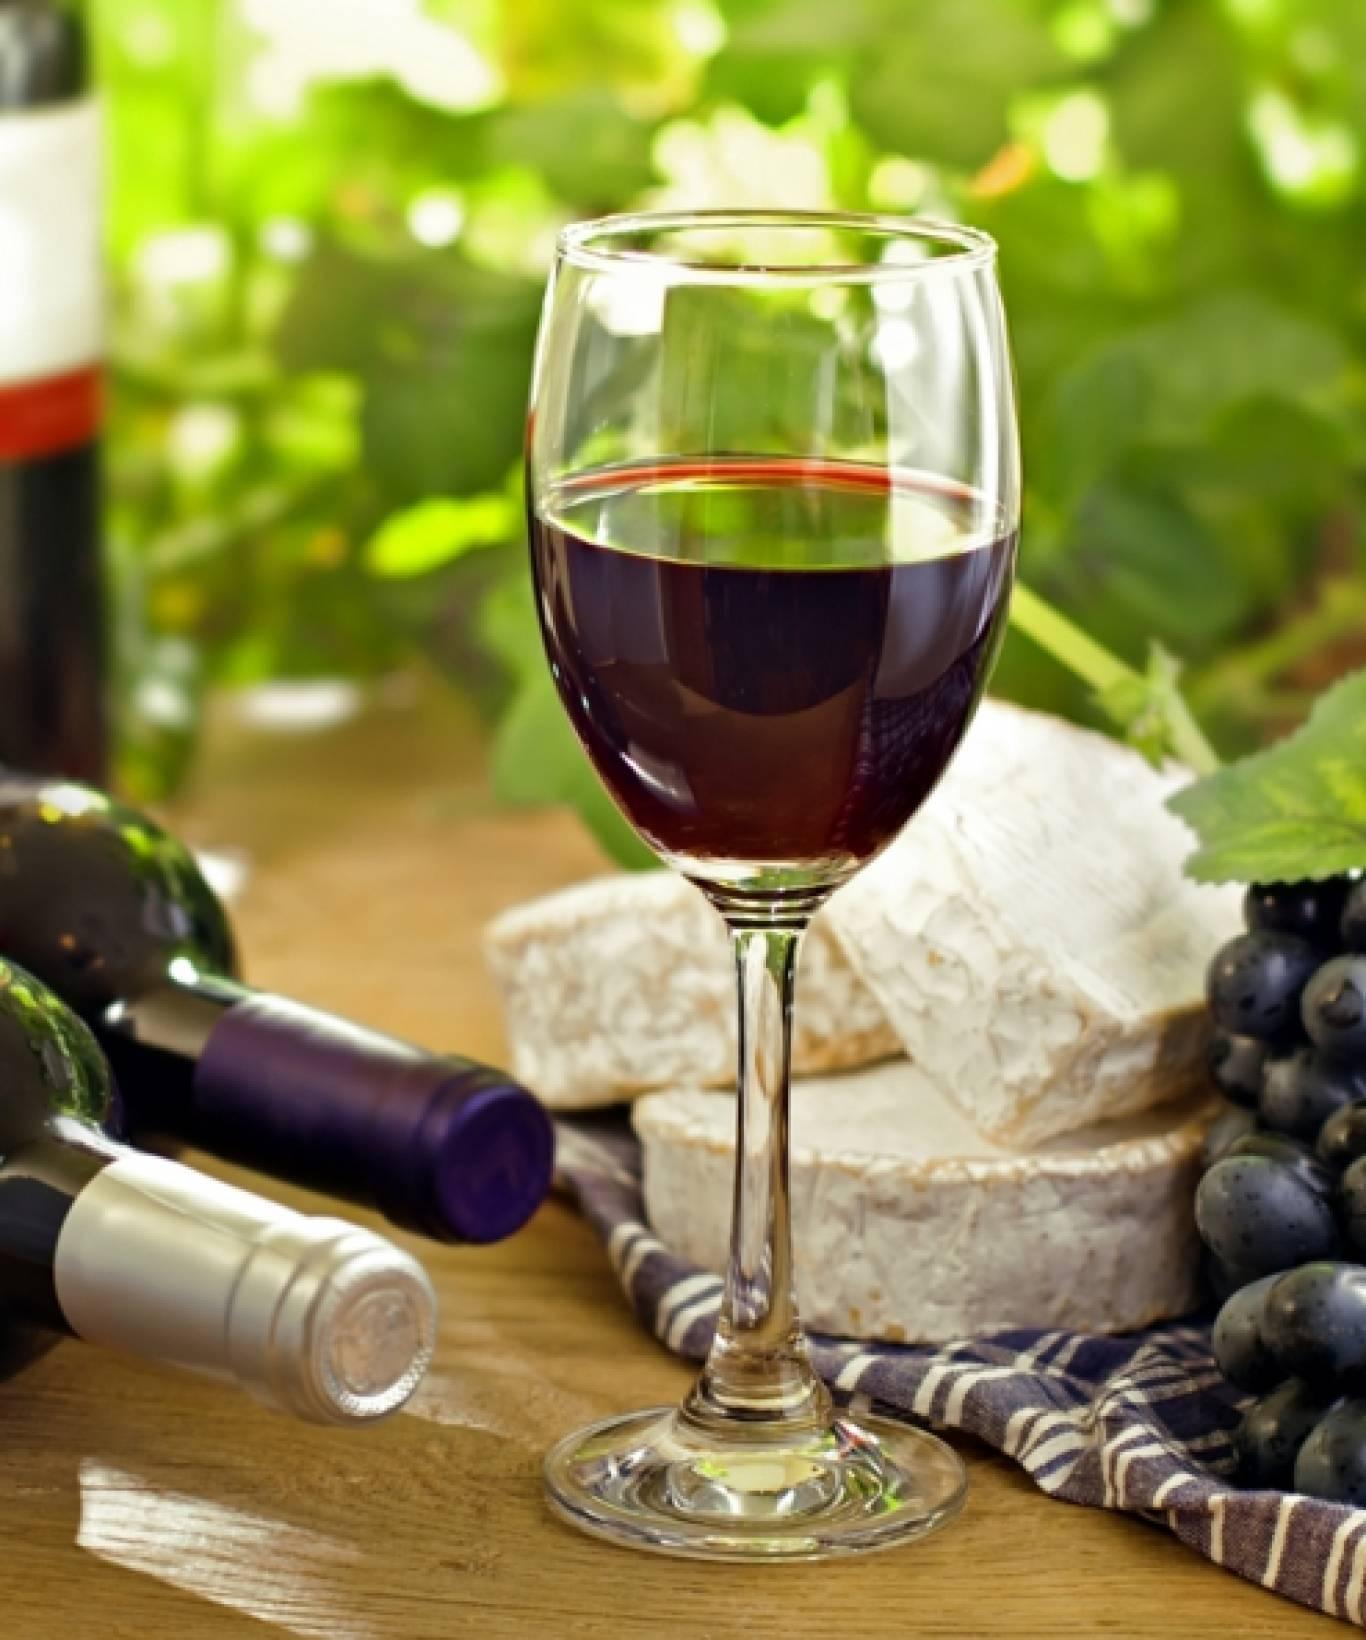 Дегустація вин ТМ Grandes Vinos